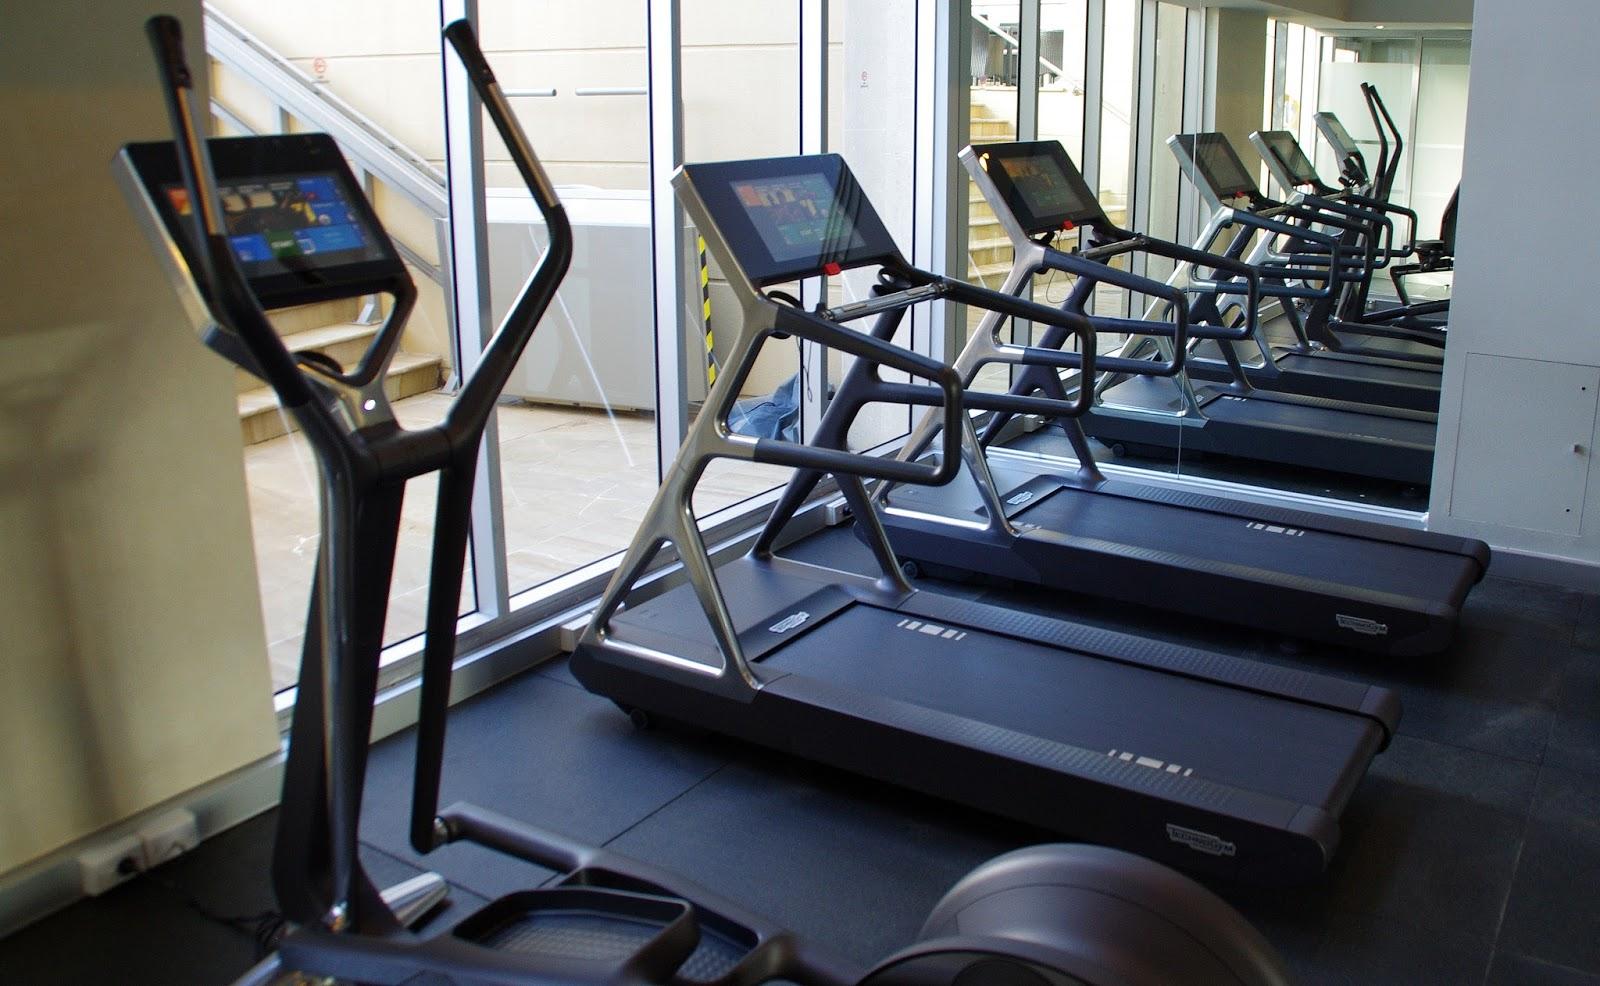 Gym at swissotel